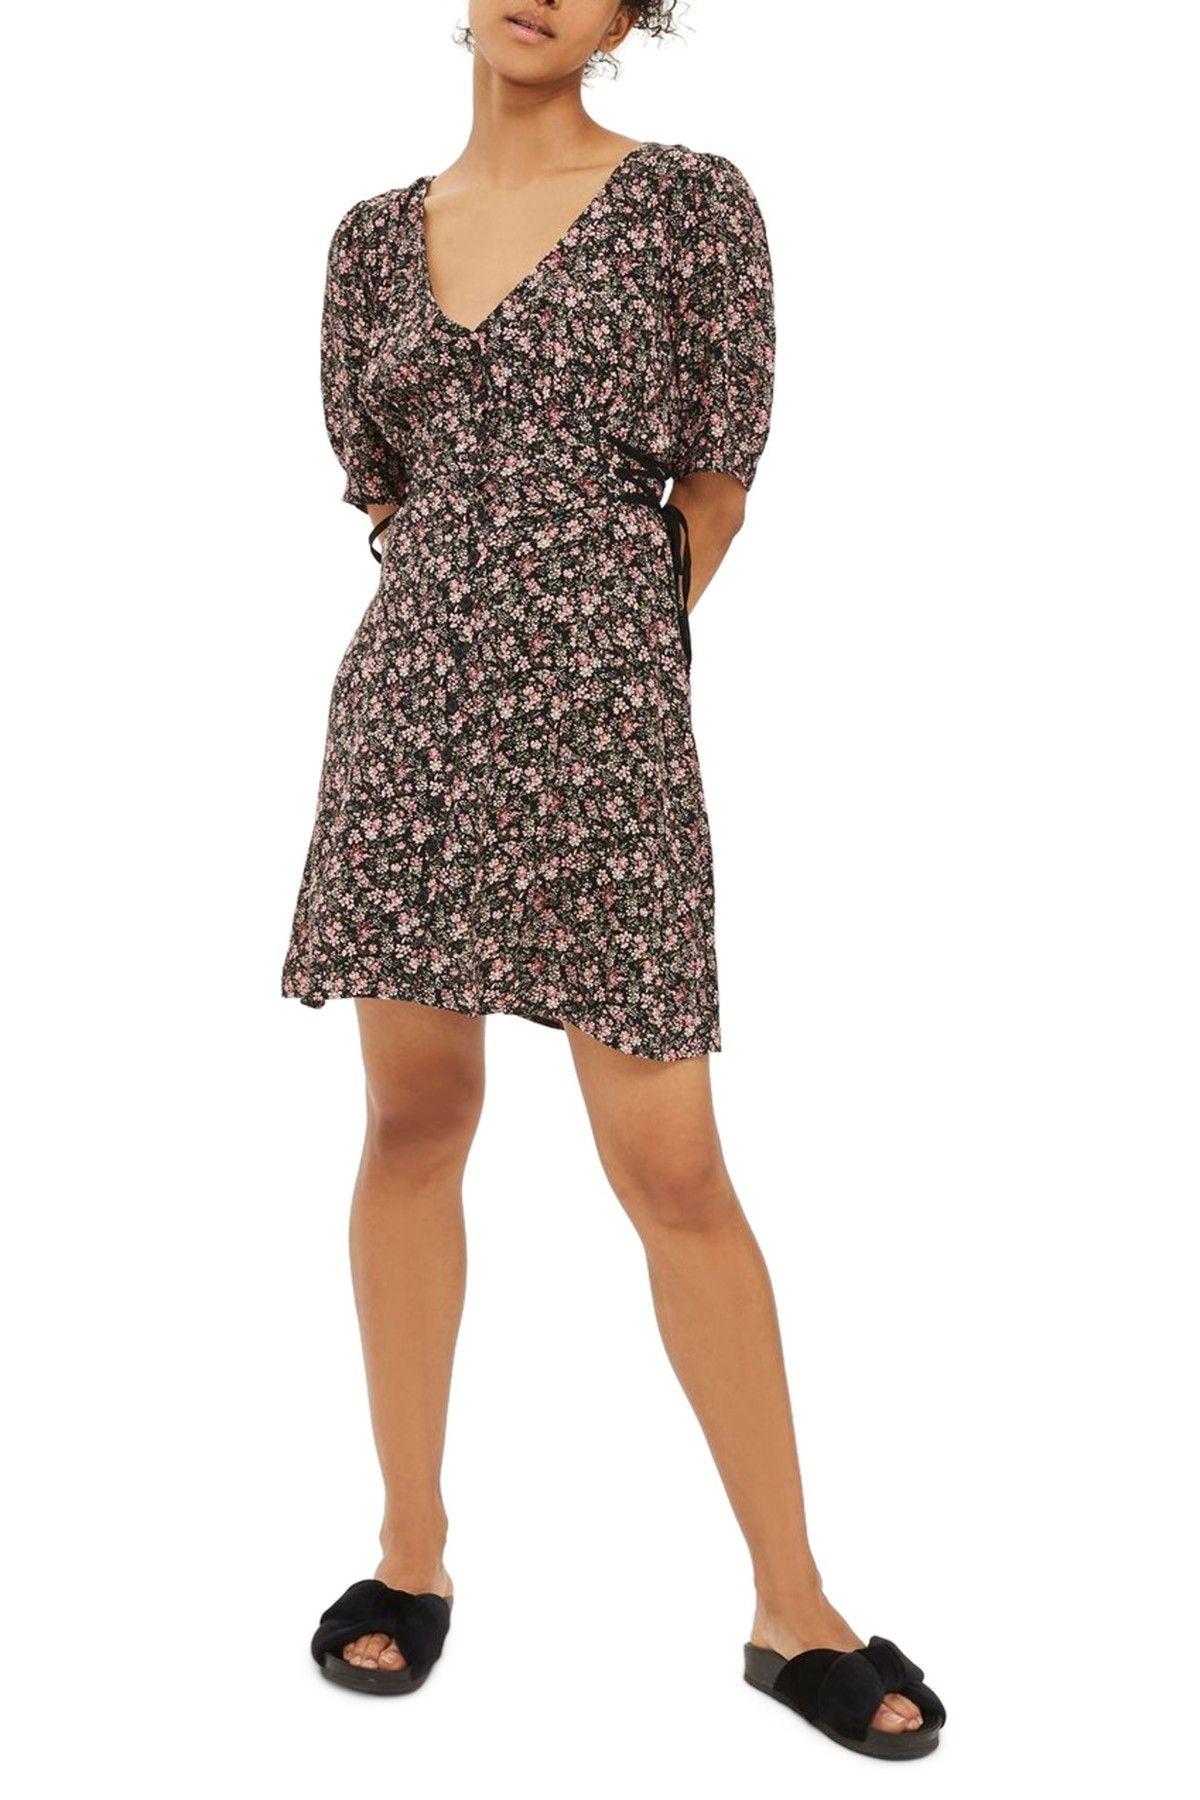 dba9efdff92e3 Maternity Dresses At Nordstrom Rack – DACC